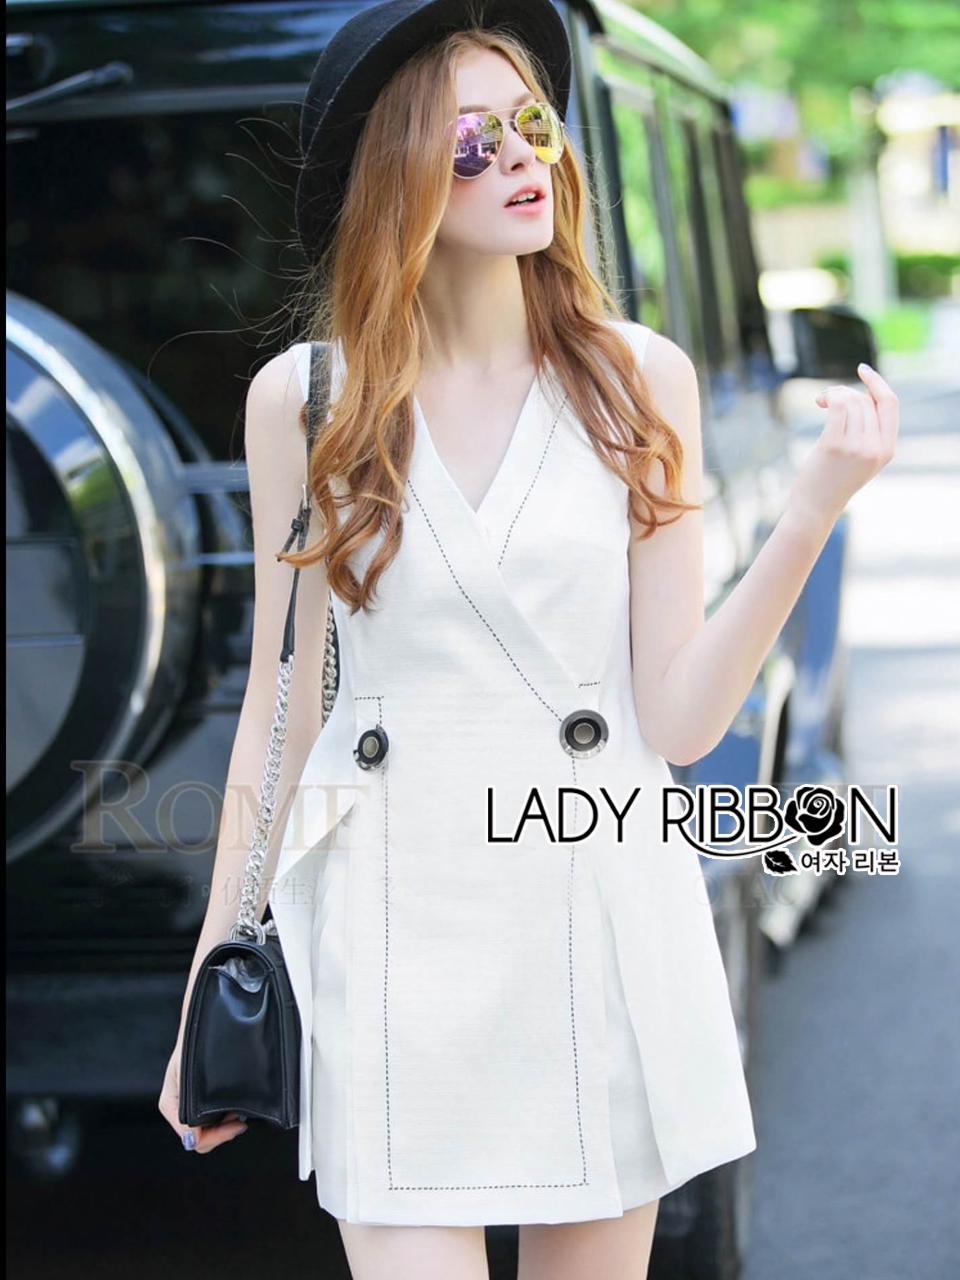 Lady Ribbon's Made &#x1F380 Lady Kelly Smart Casual Sleeveless Suit and Shorts Set เซ็ตเสื้อสูทแขนกุดตกแต่งกระดุม ตัวเสื้อเป็นแบบสูทลำลอง ผ่าด้านหน้าสองข้าง ส่วนกางเกงเป็นทรงเอวสูงสีเดียวกับเสื้อ เนื้อผ้า Cotton+Lenin 100%